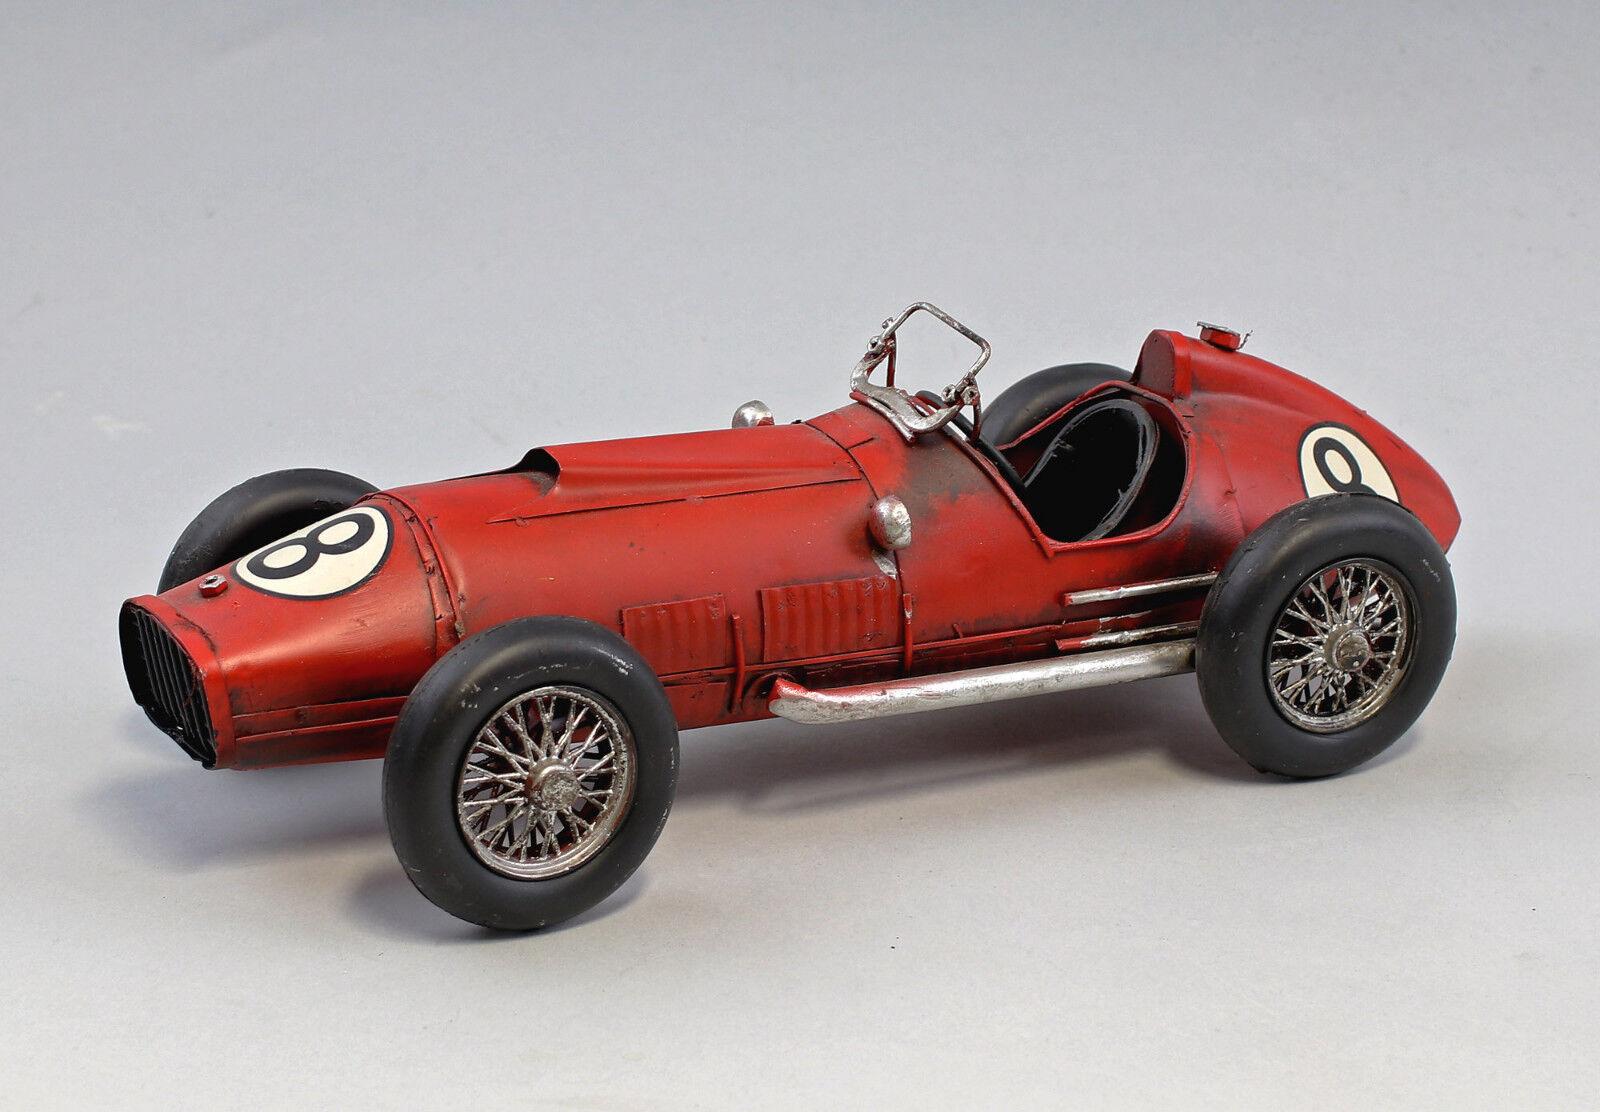 9973025 Nostalgic Model Car Classic Car Cabriolet Red Race Car 33x12x10cm